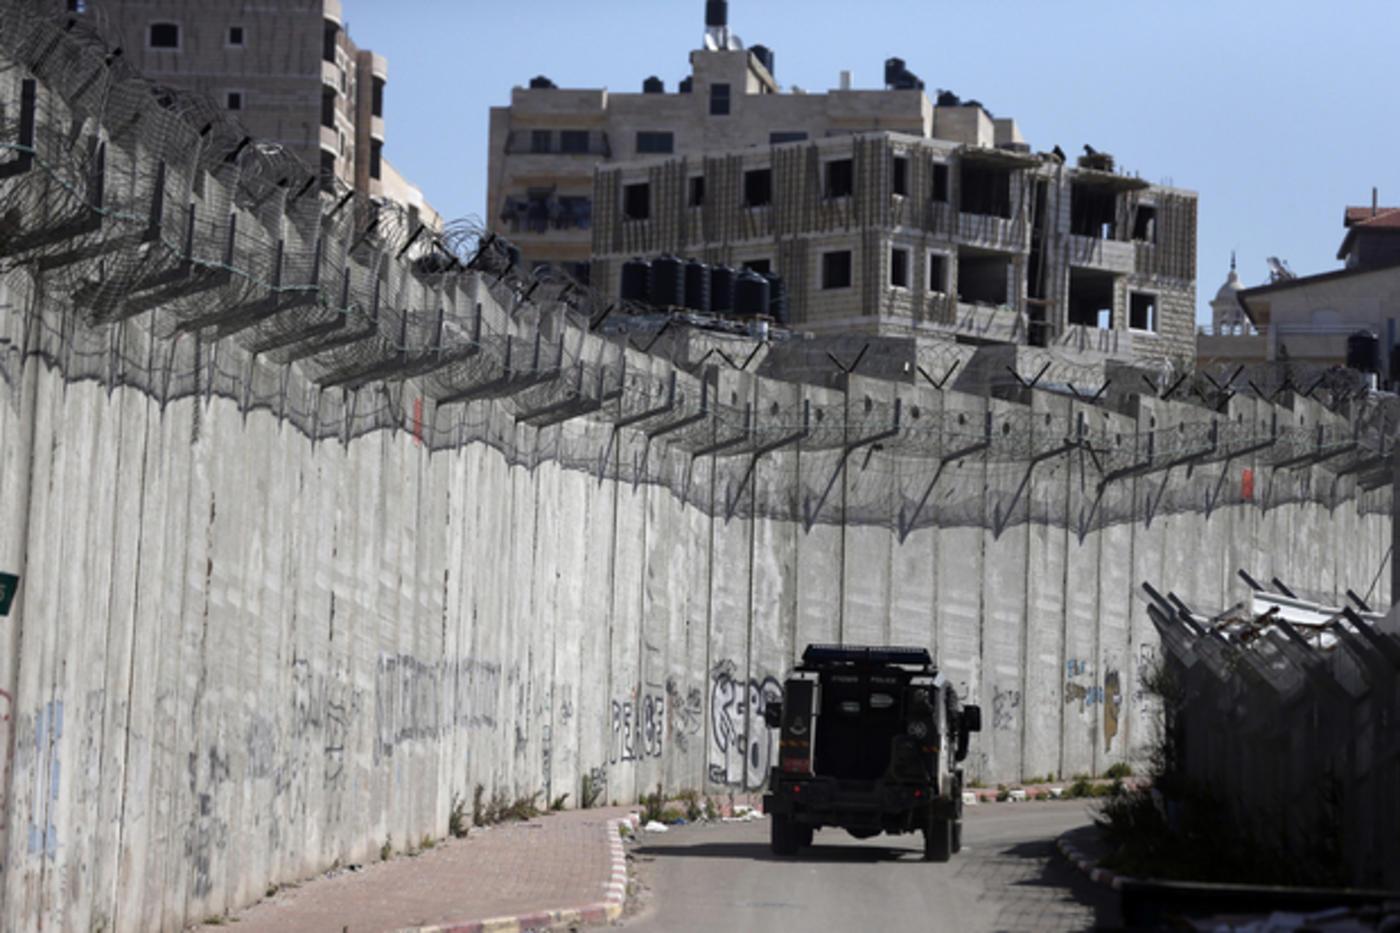 International law gave a clear ruling against Israel's wall